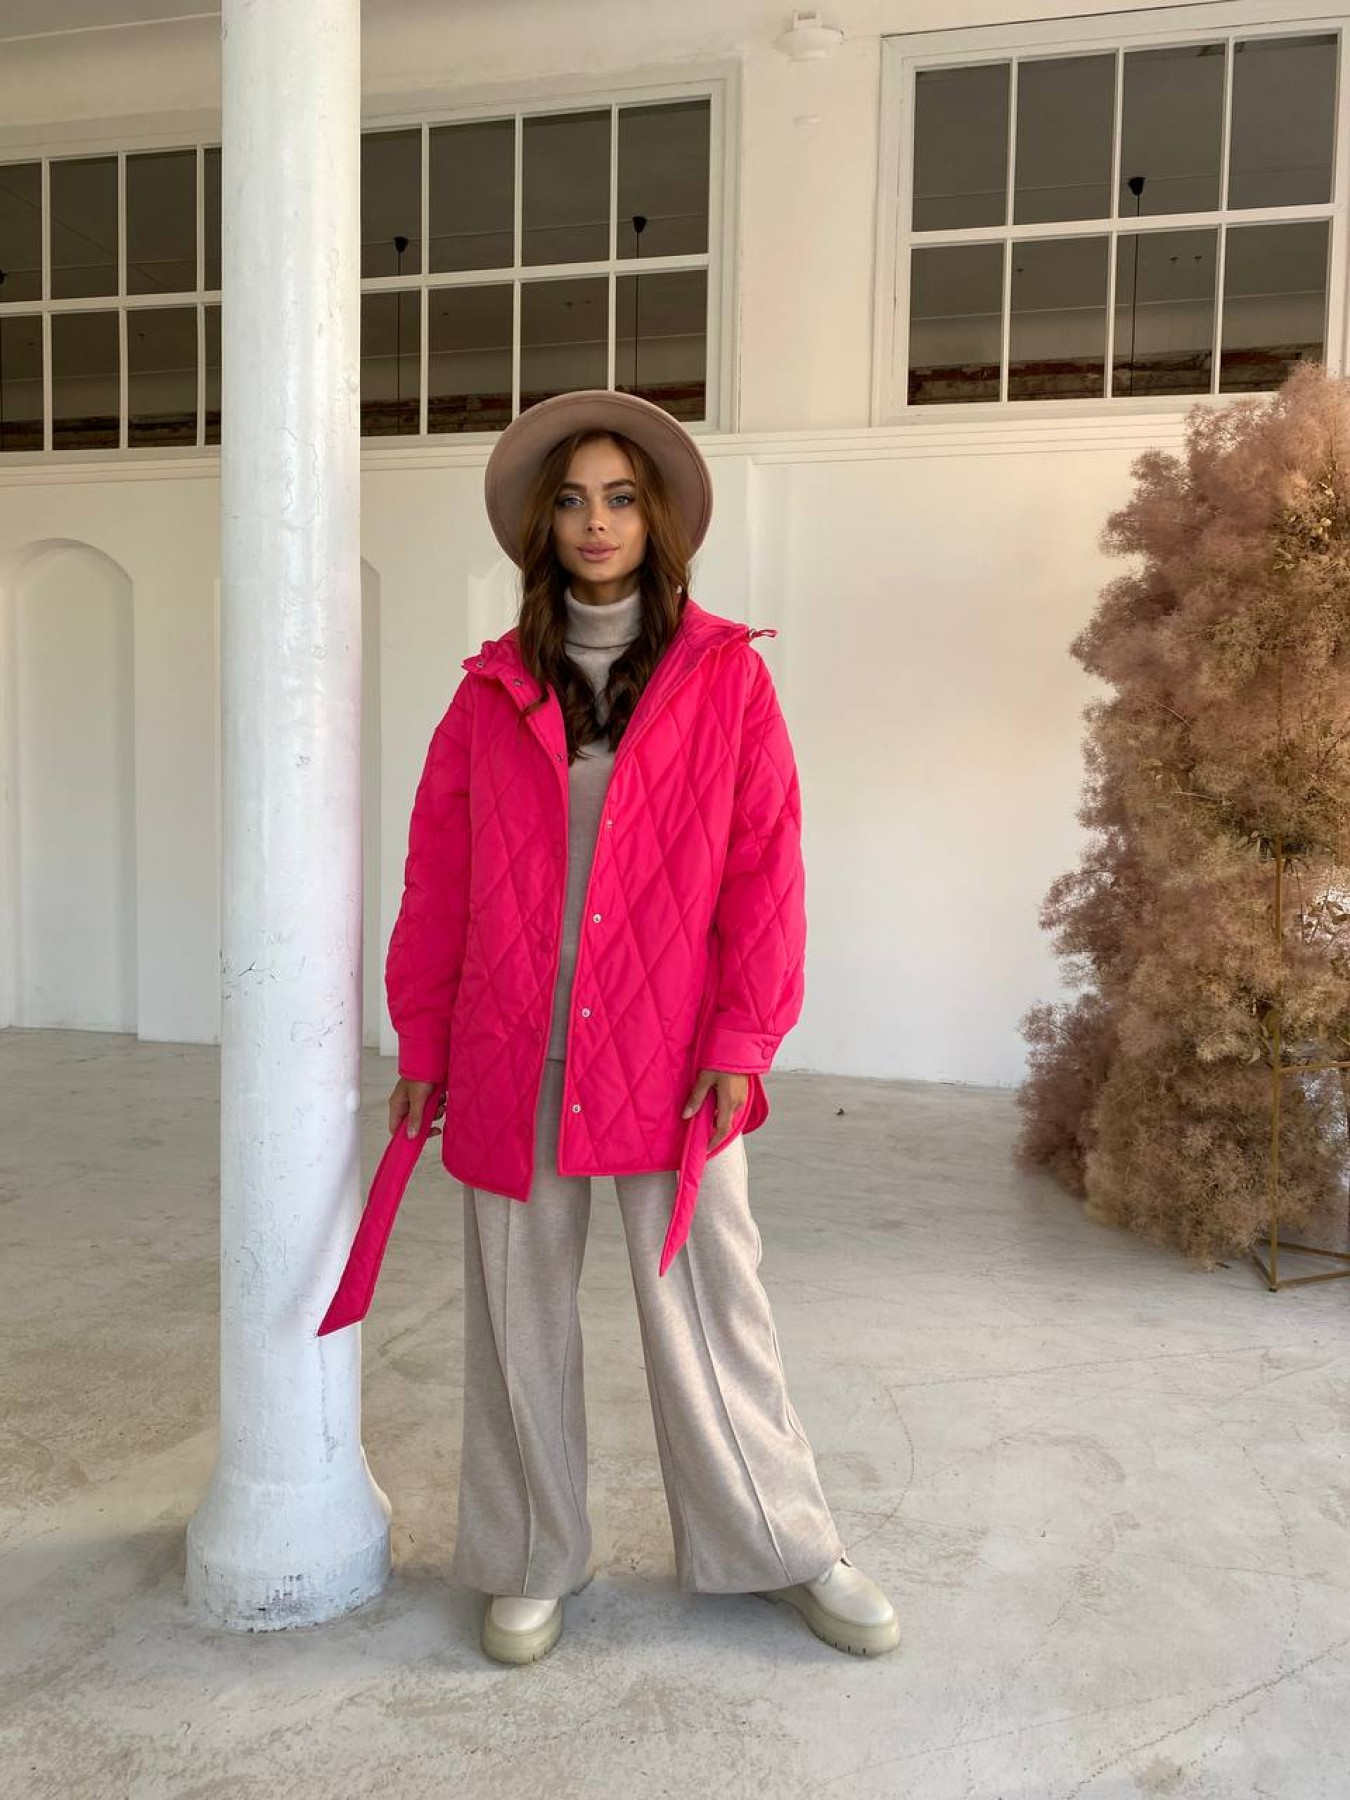 Пазл стеганая куртка из плащевки 11764 АРТ. 48504 Цвет: Малина - фото 1, интернет магазин tm-modus.ru